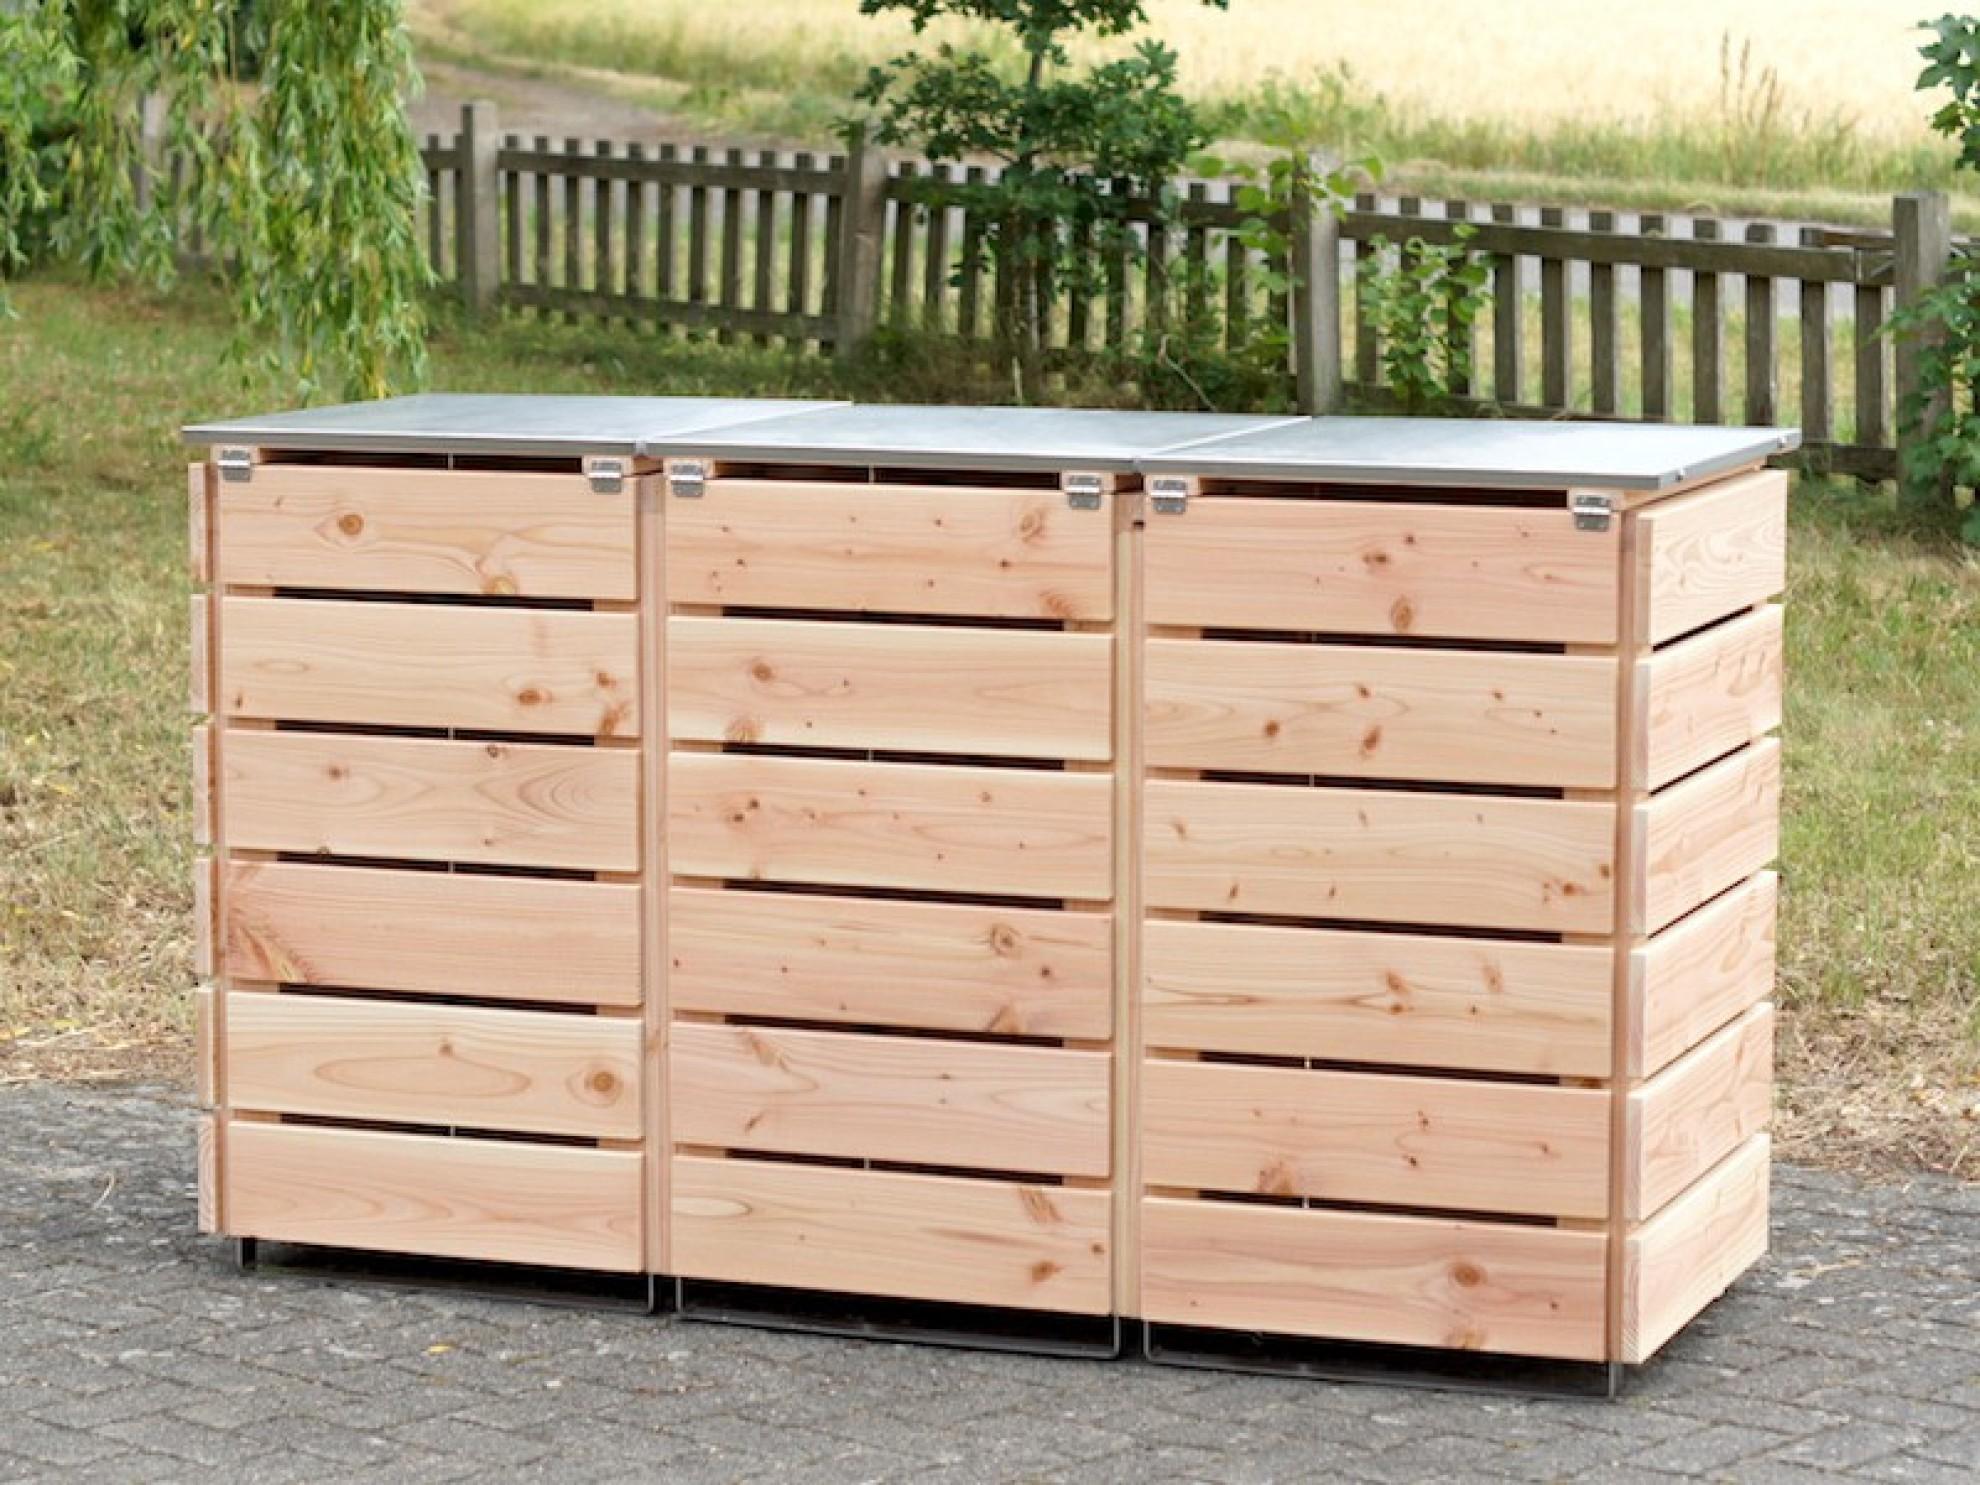 3er m lltonnenbox 120 liter heimisches holz made in germany. Black Bedroom Furniture Sets. Home Design Ideas